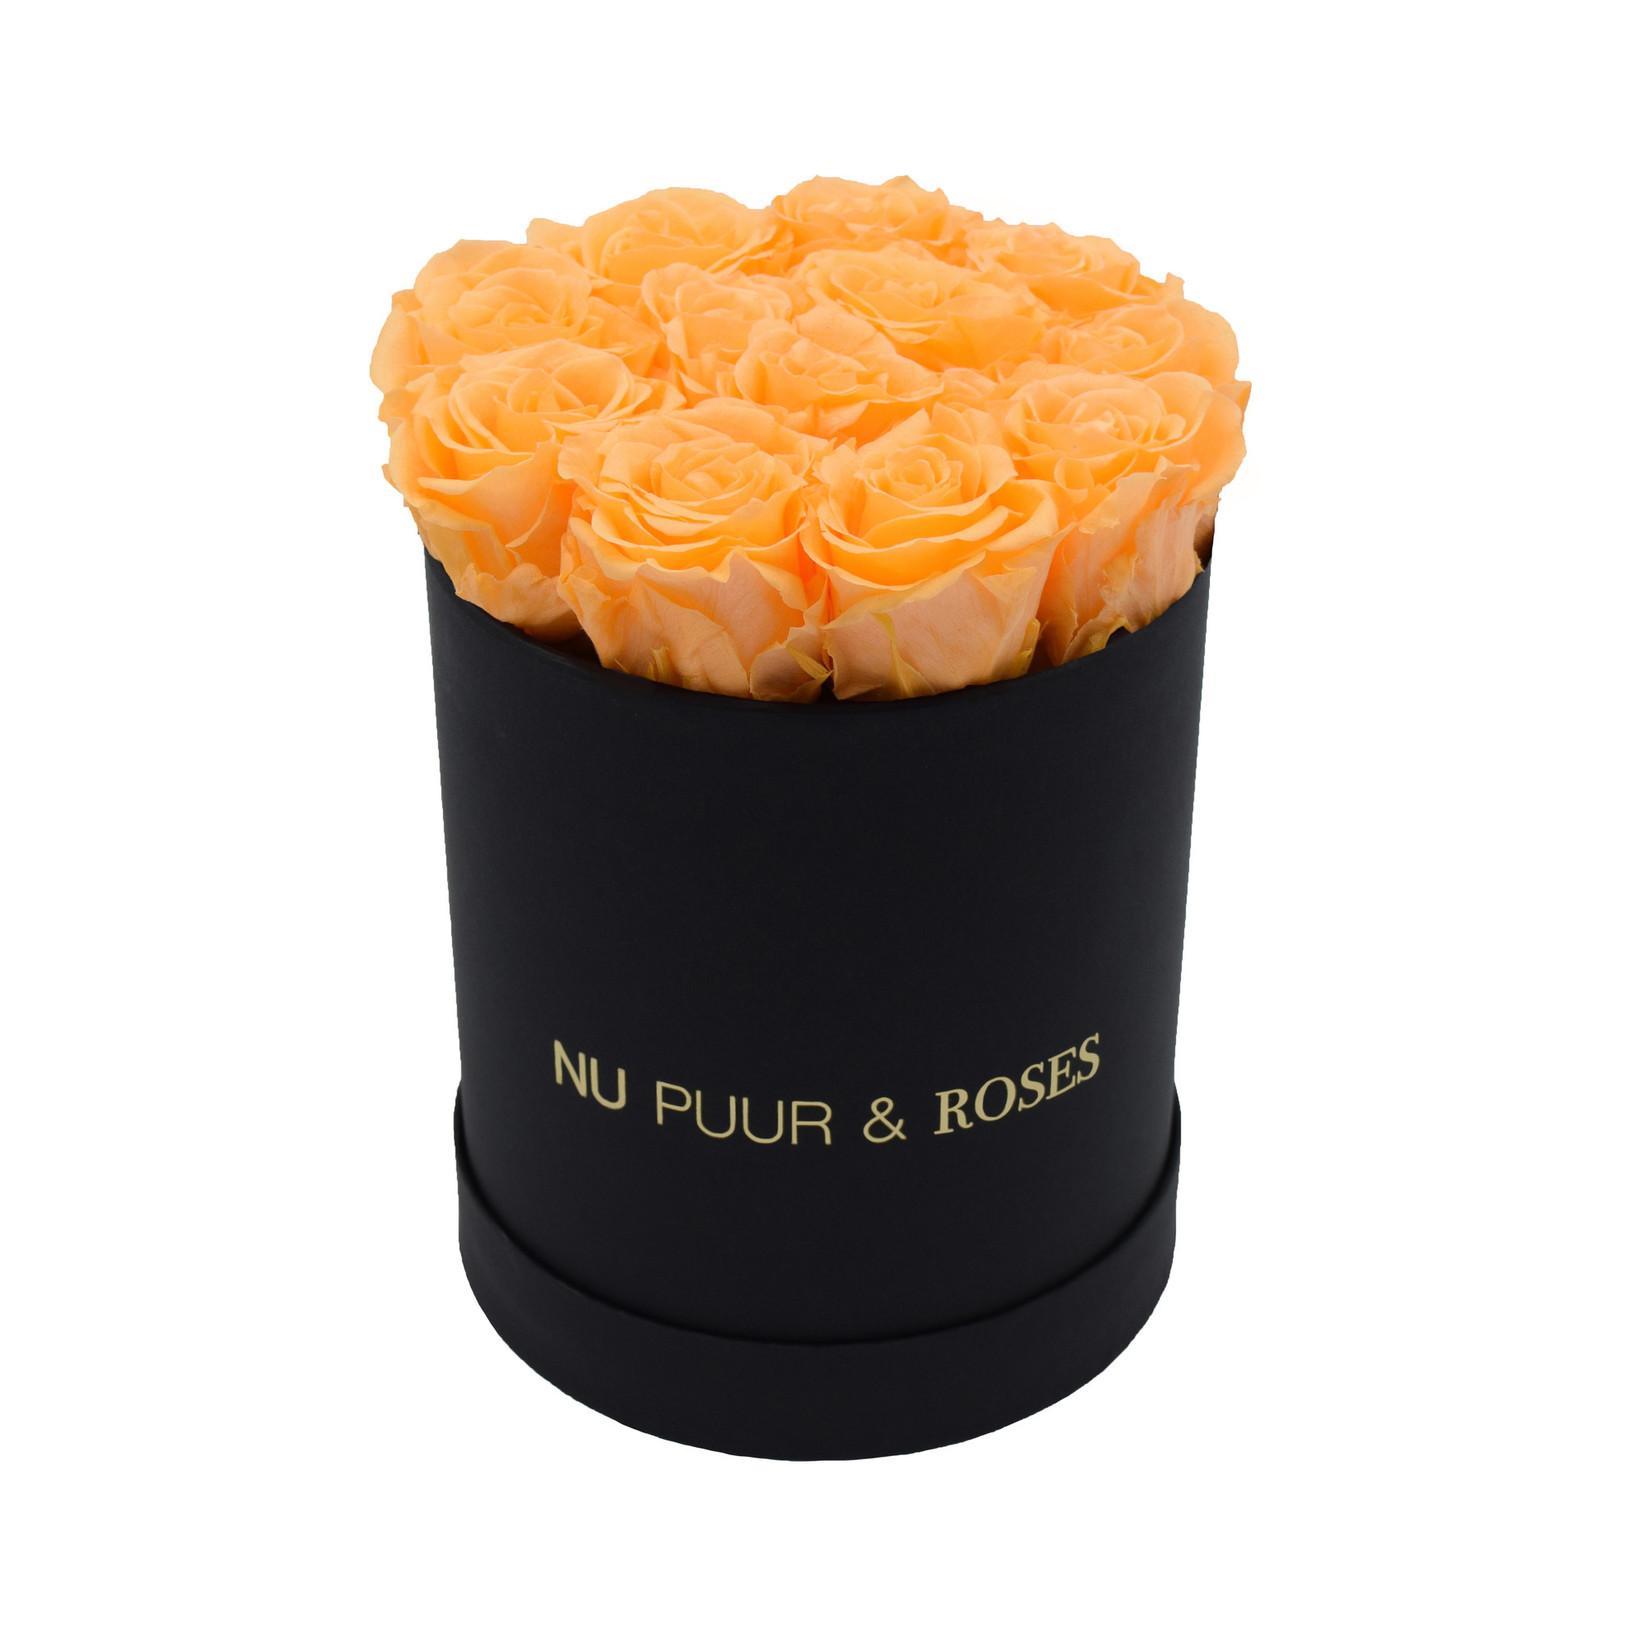 Small - Peach Endless Roses - Black Box